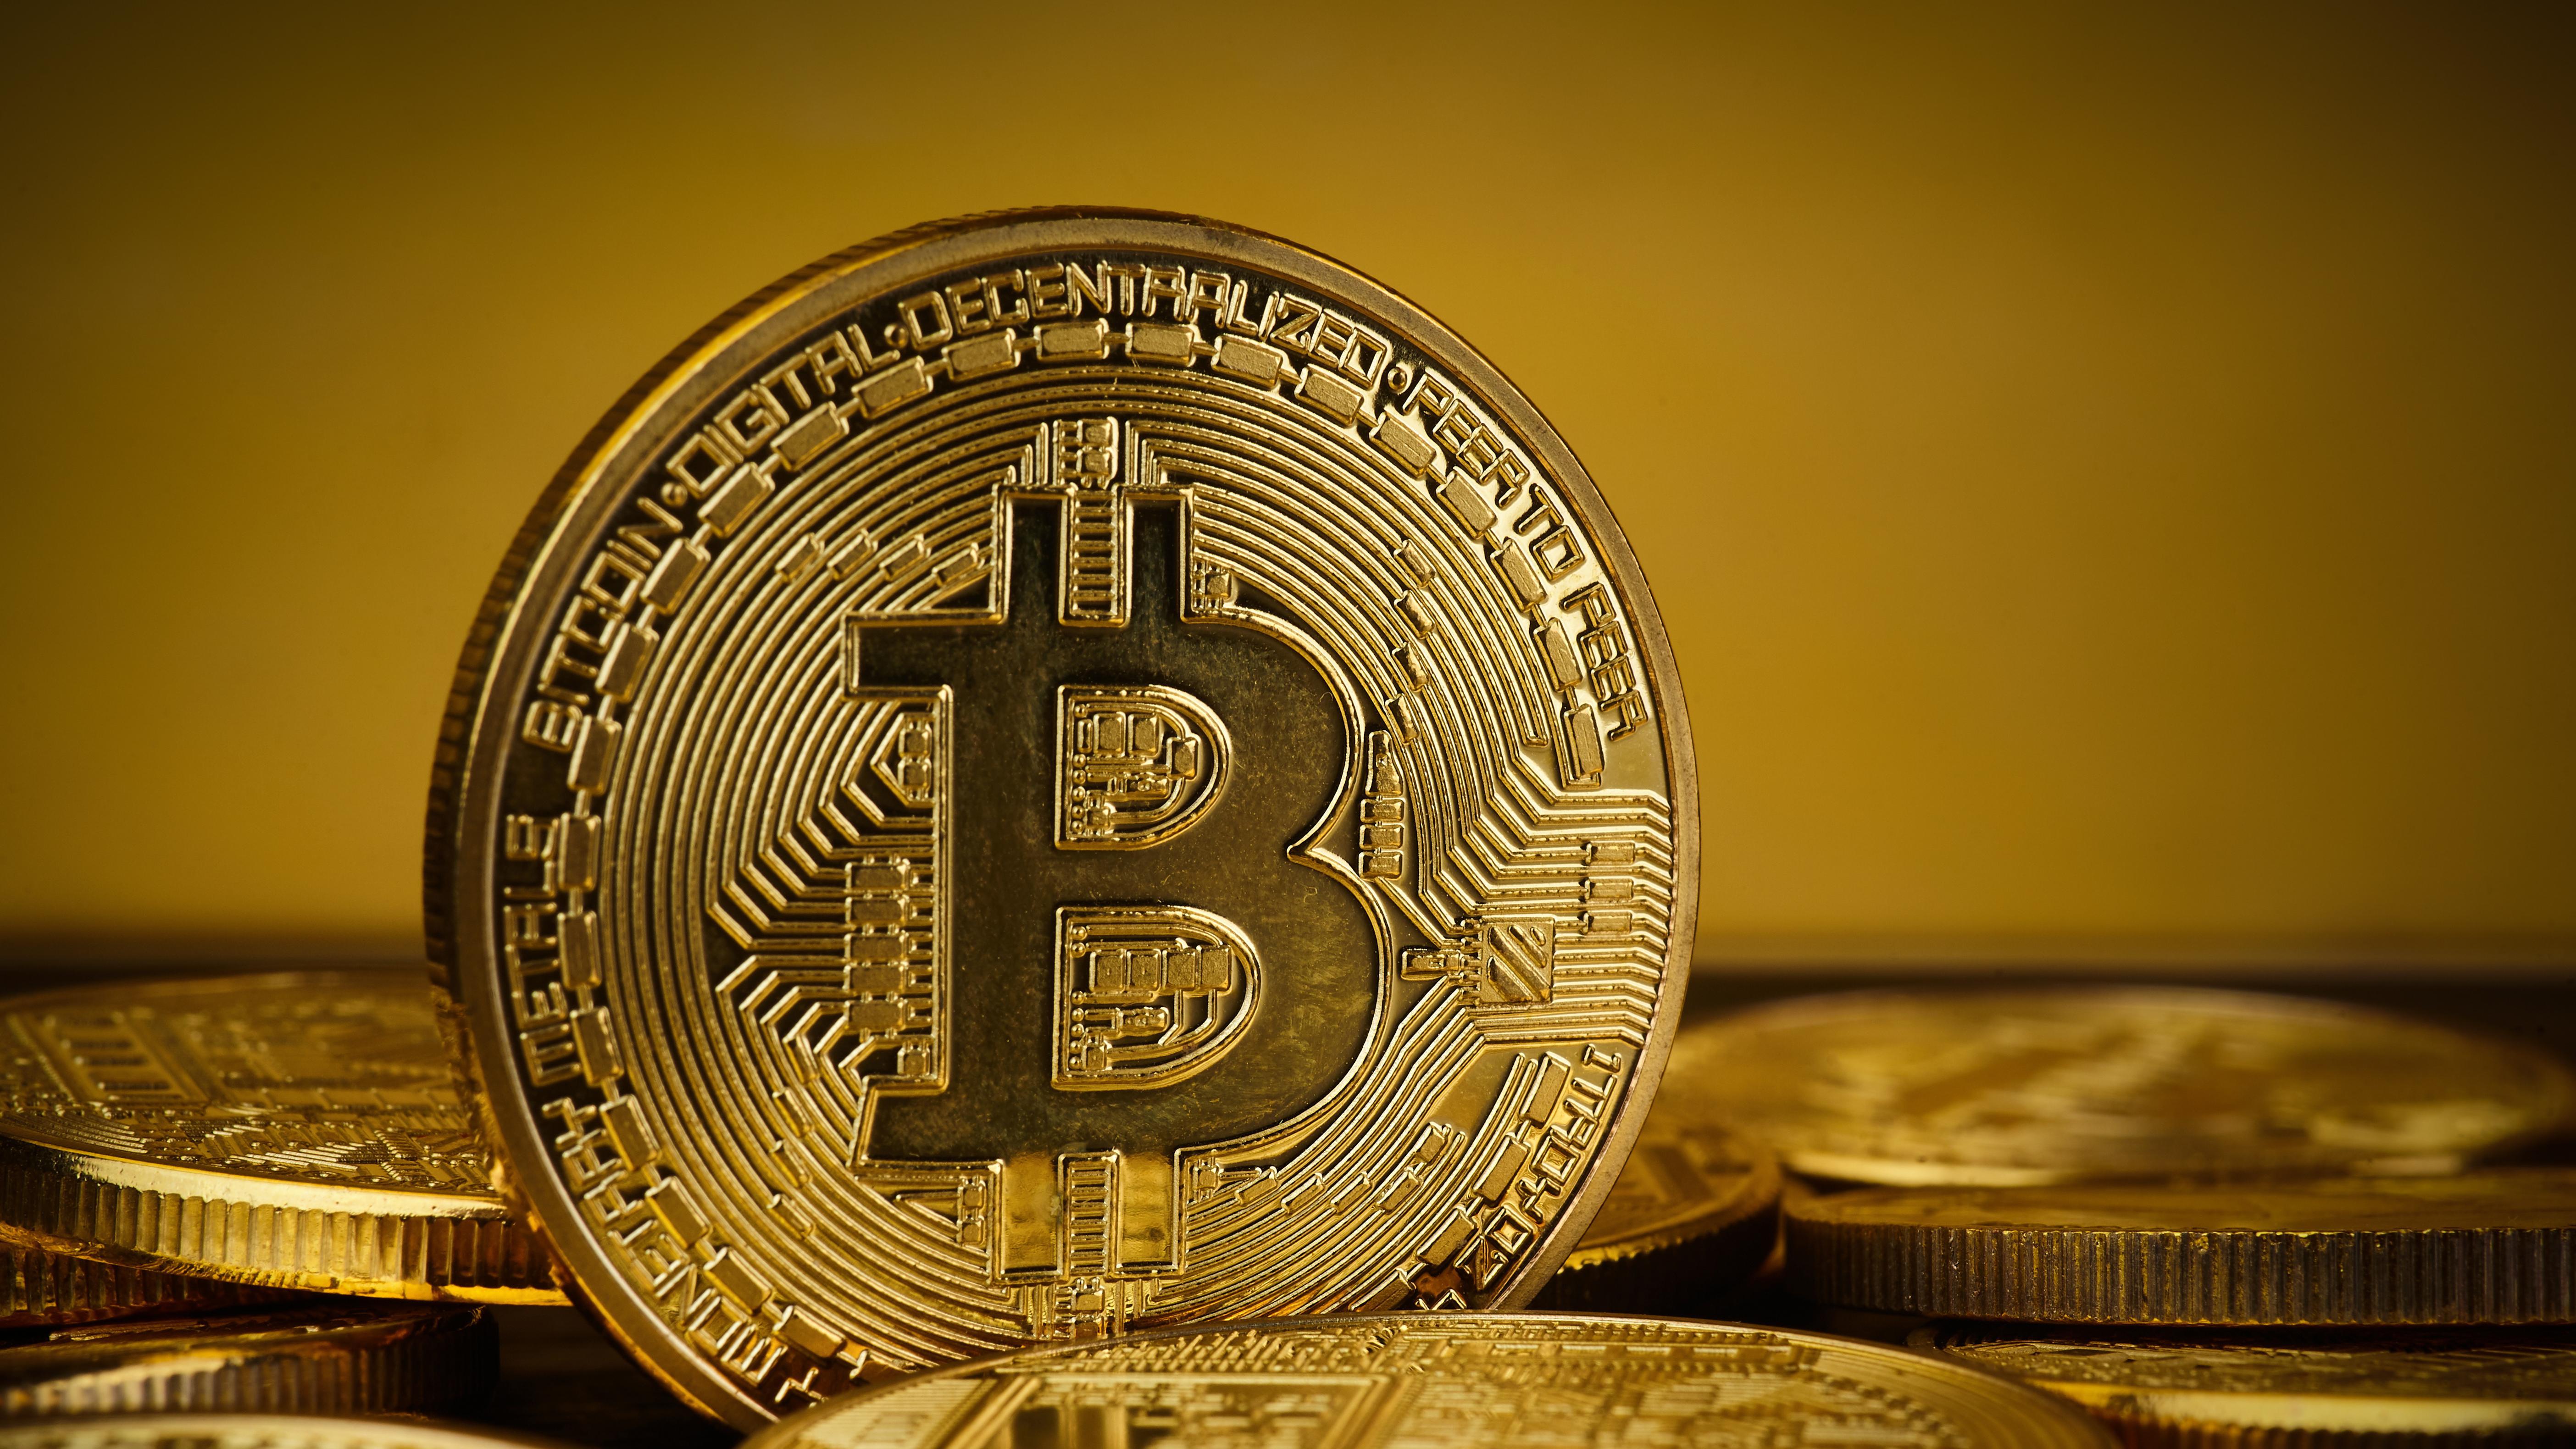 cme group bitcoin trader death